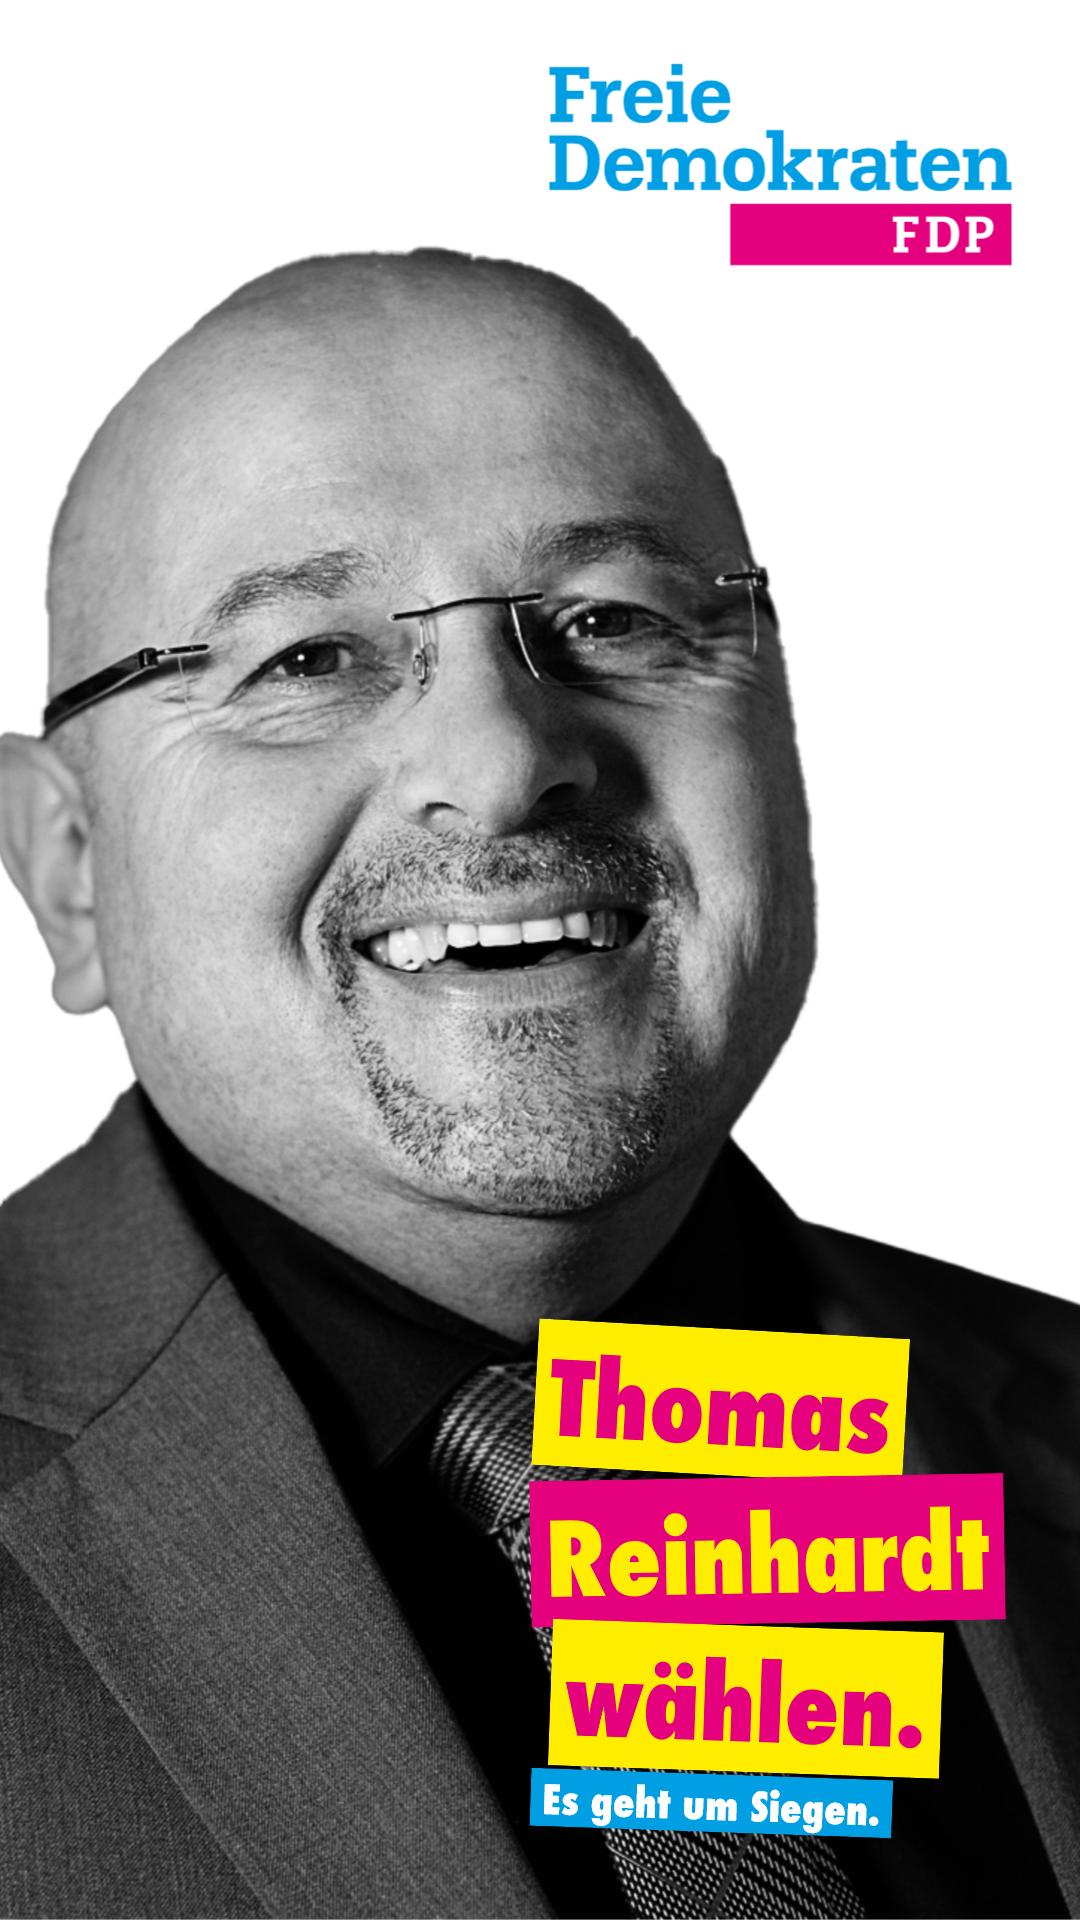 Thomas Reinhardt